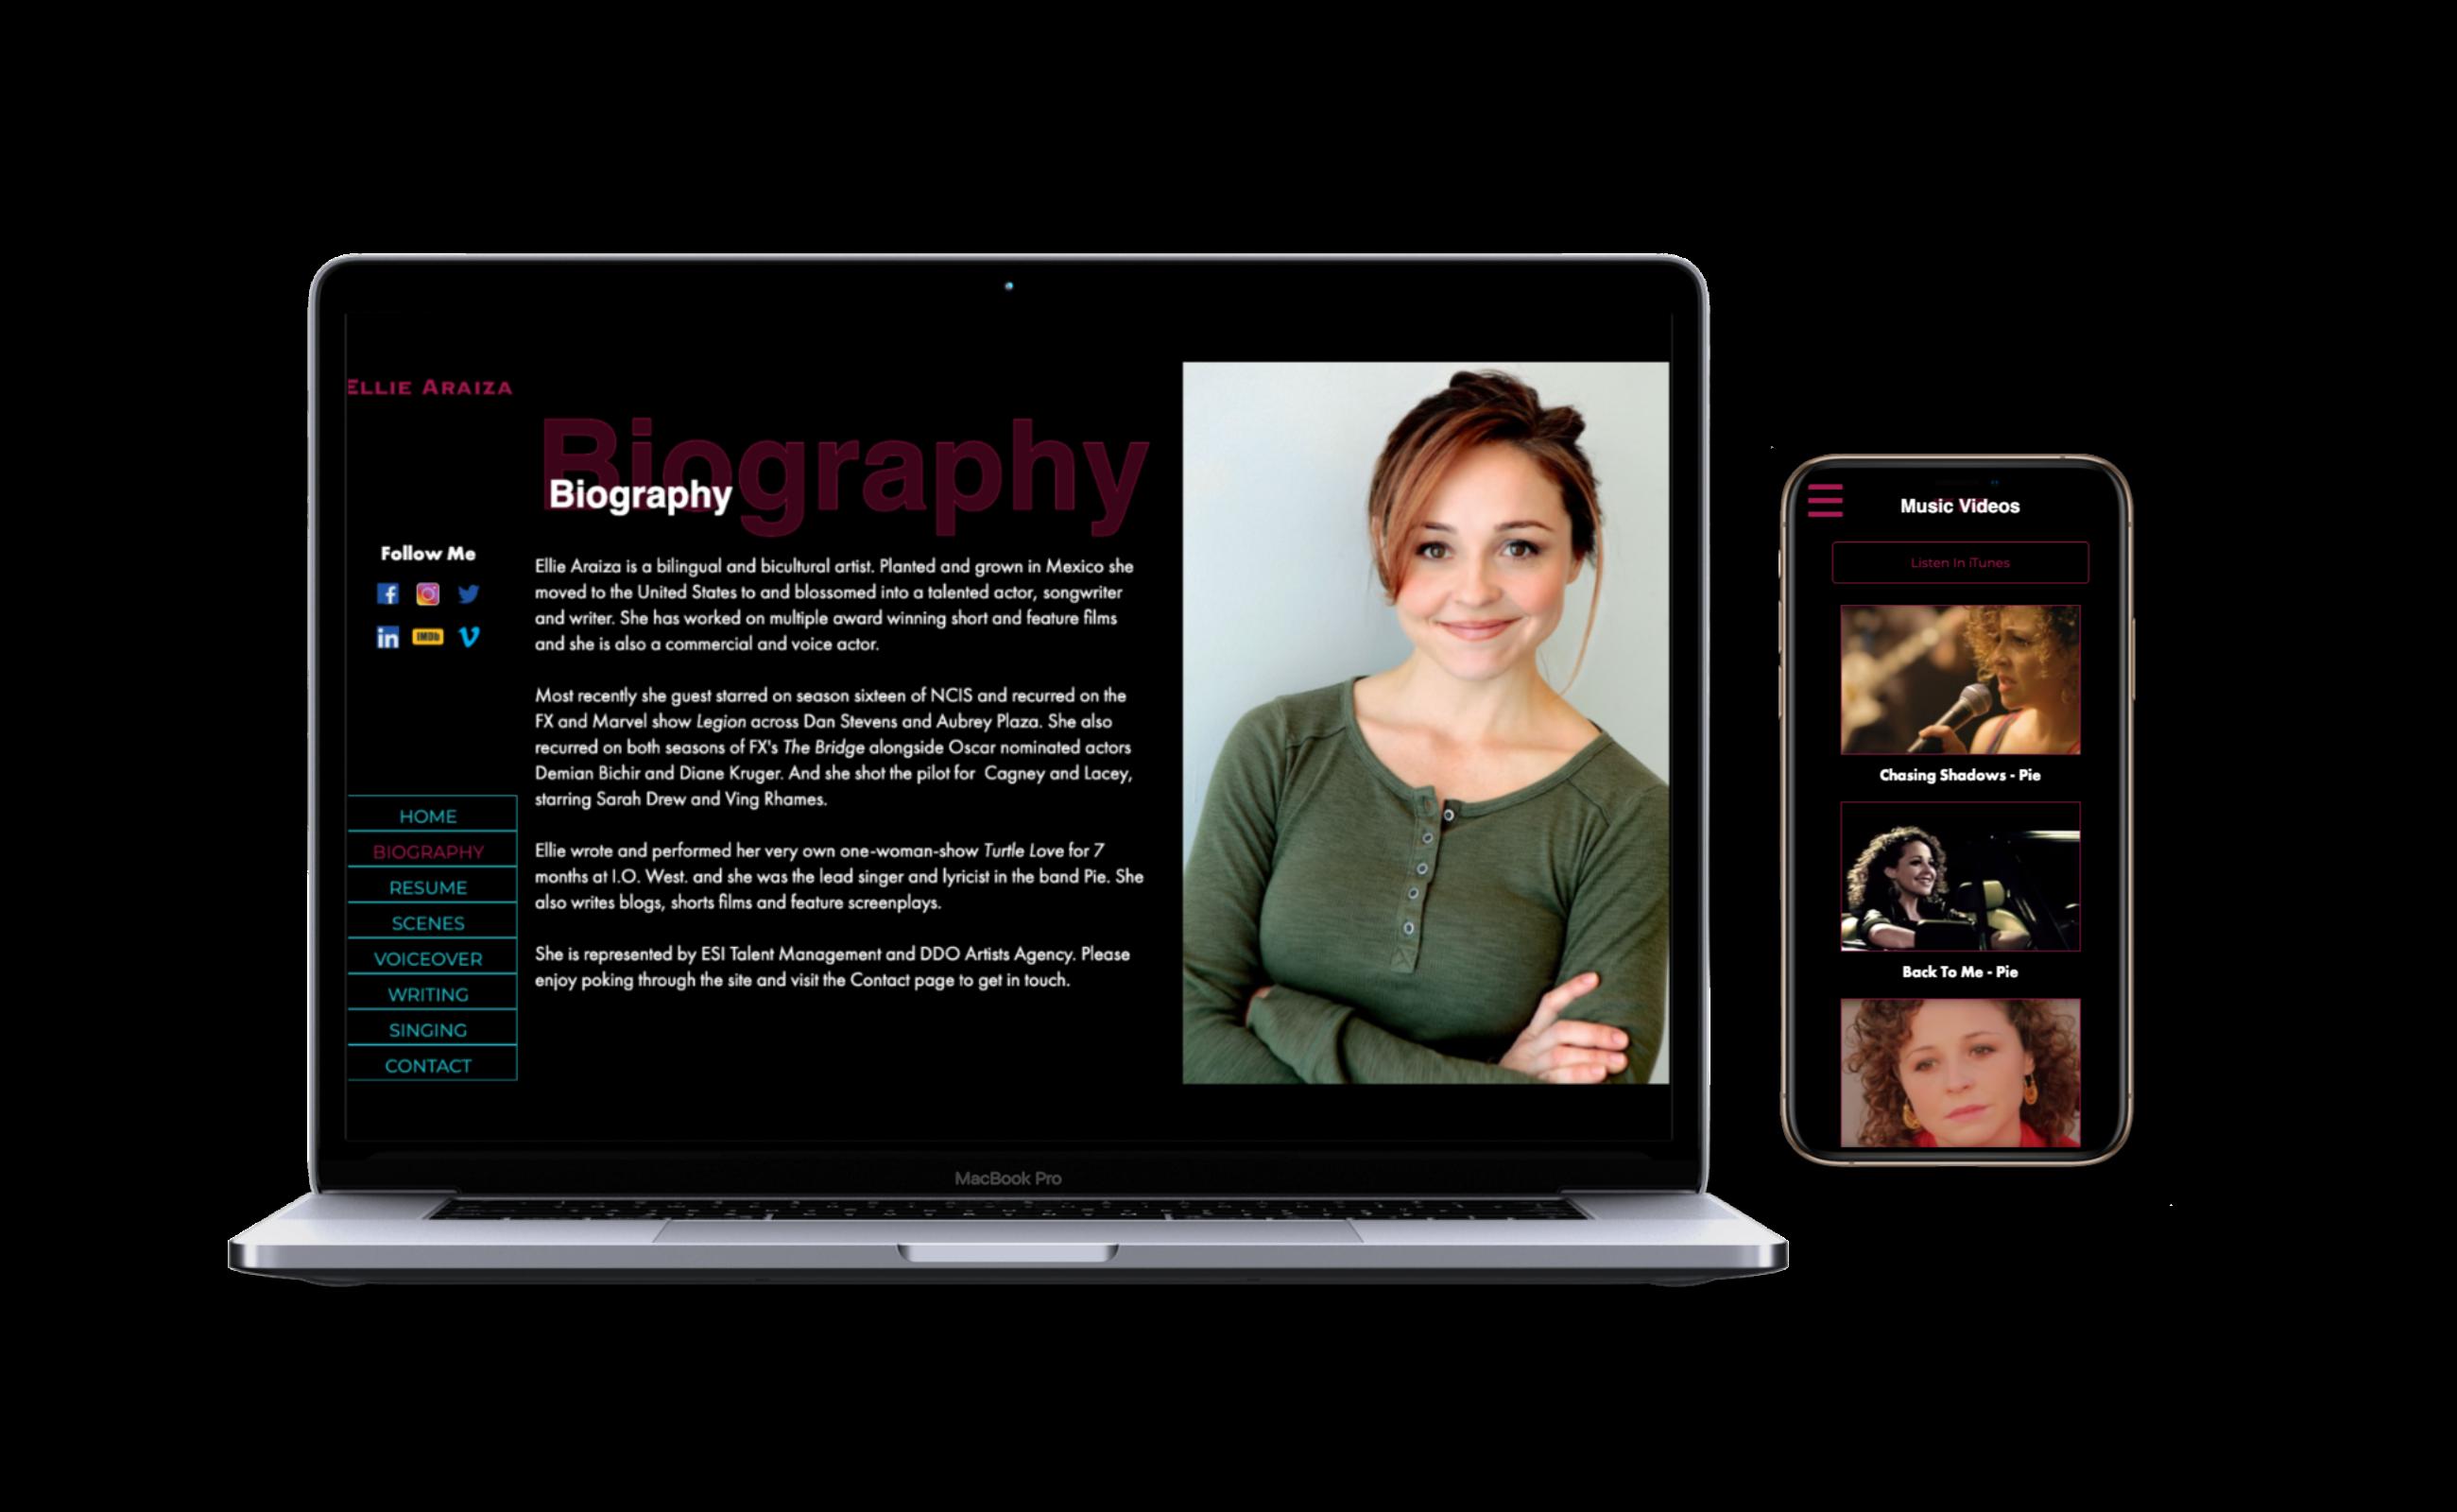 Devices With Ellie Araiza Website